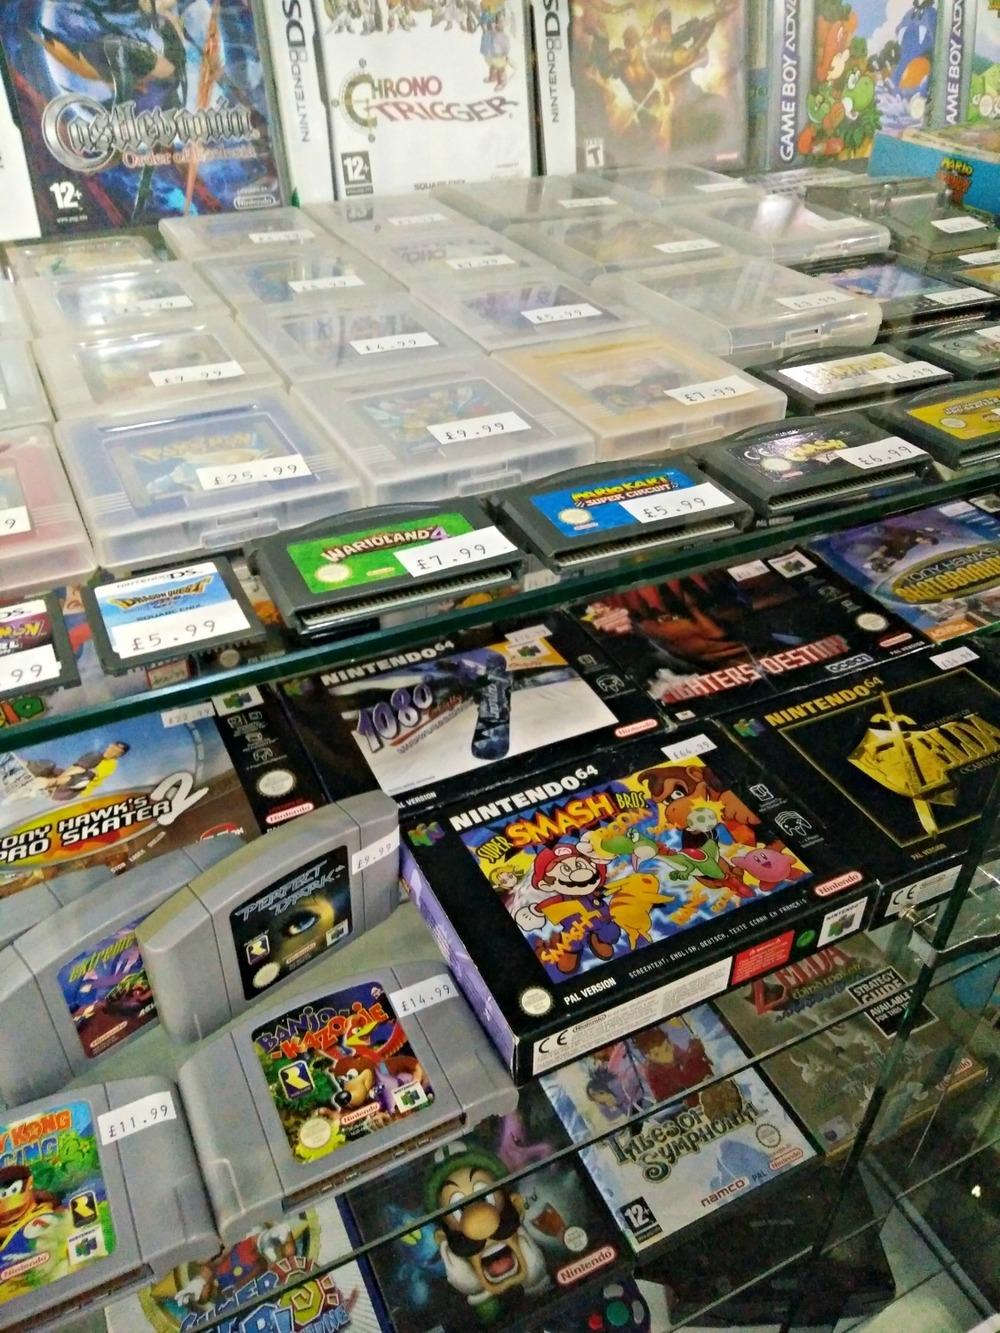 Retro games at Shmup